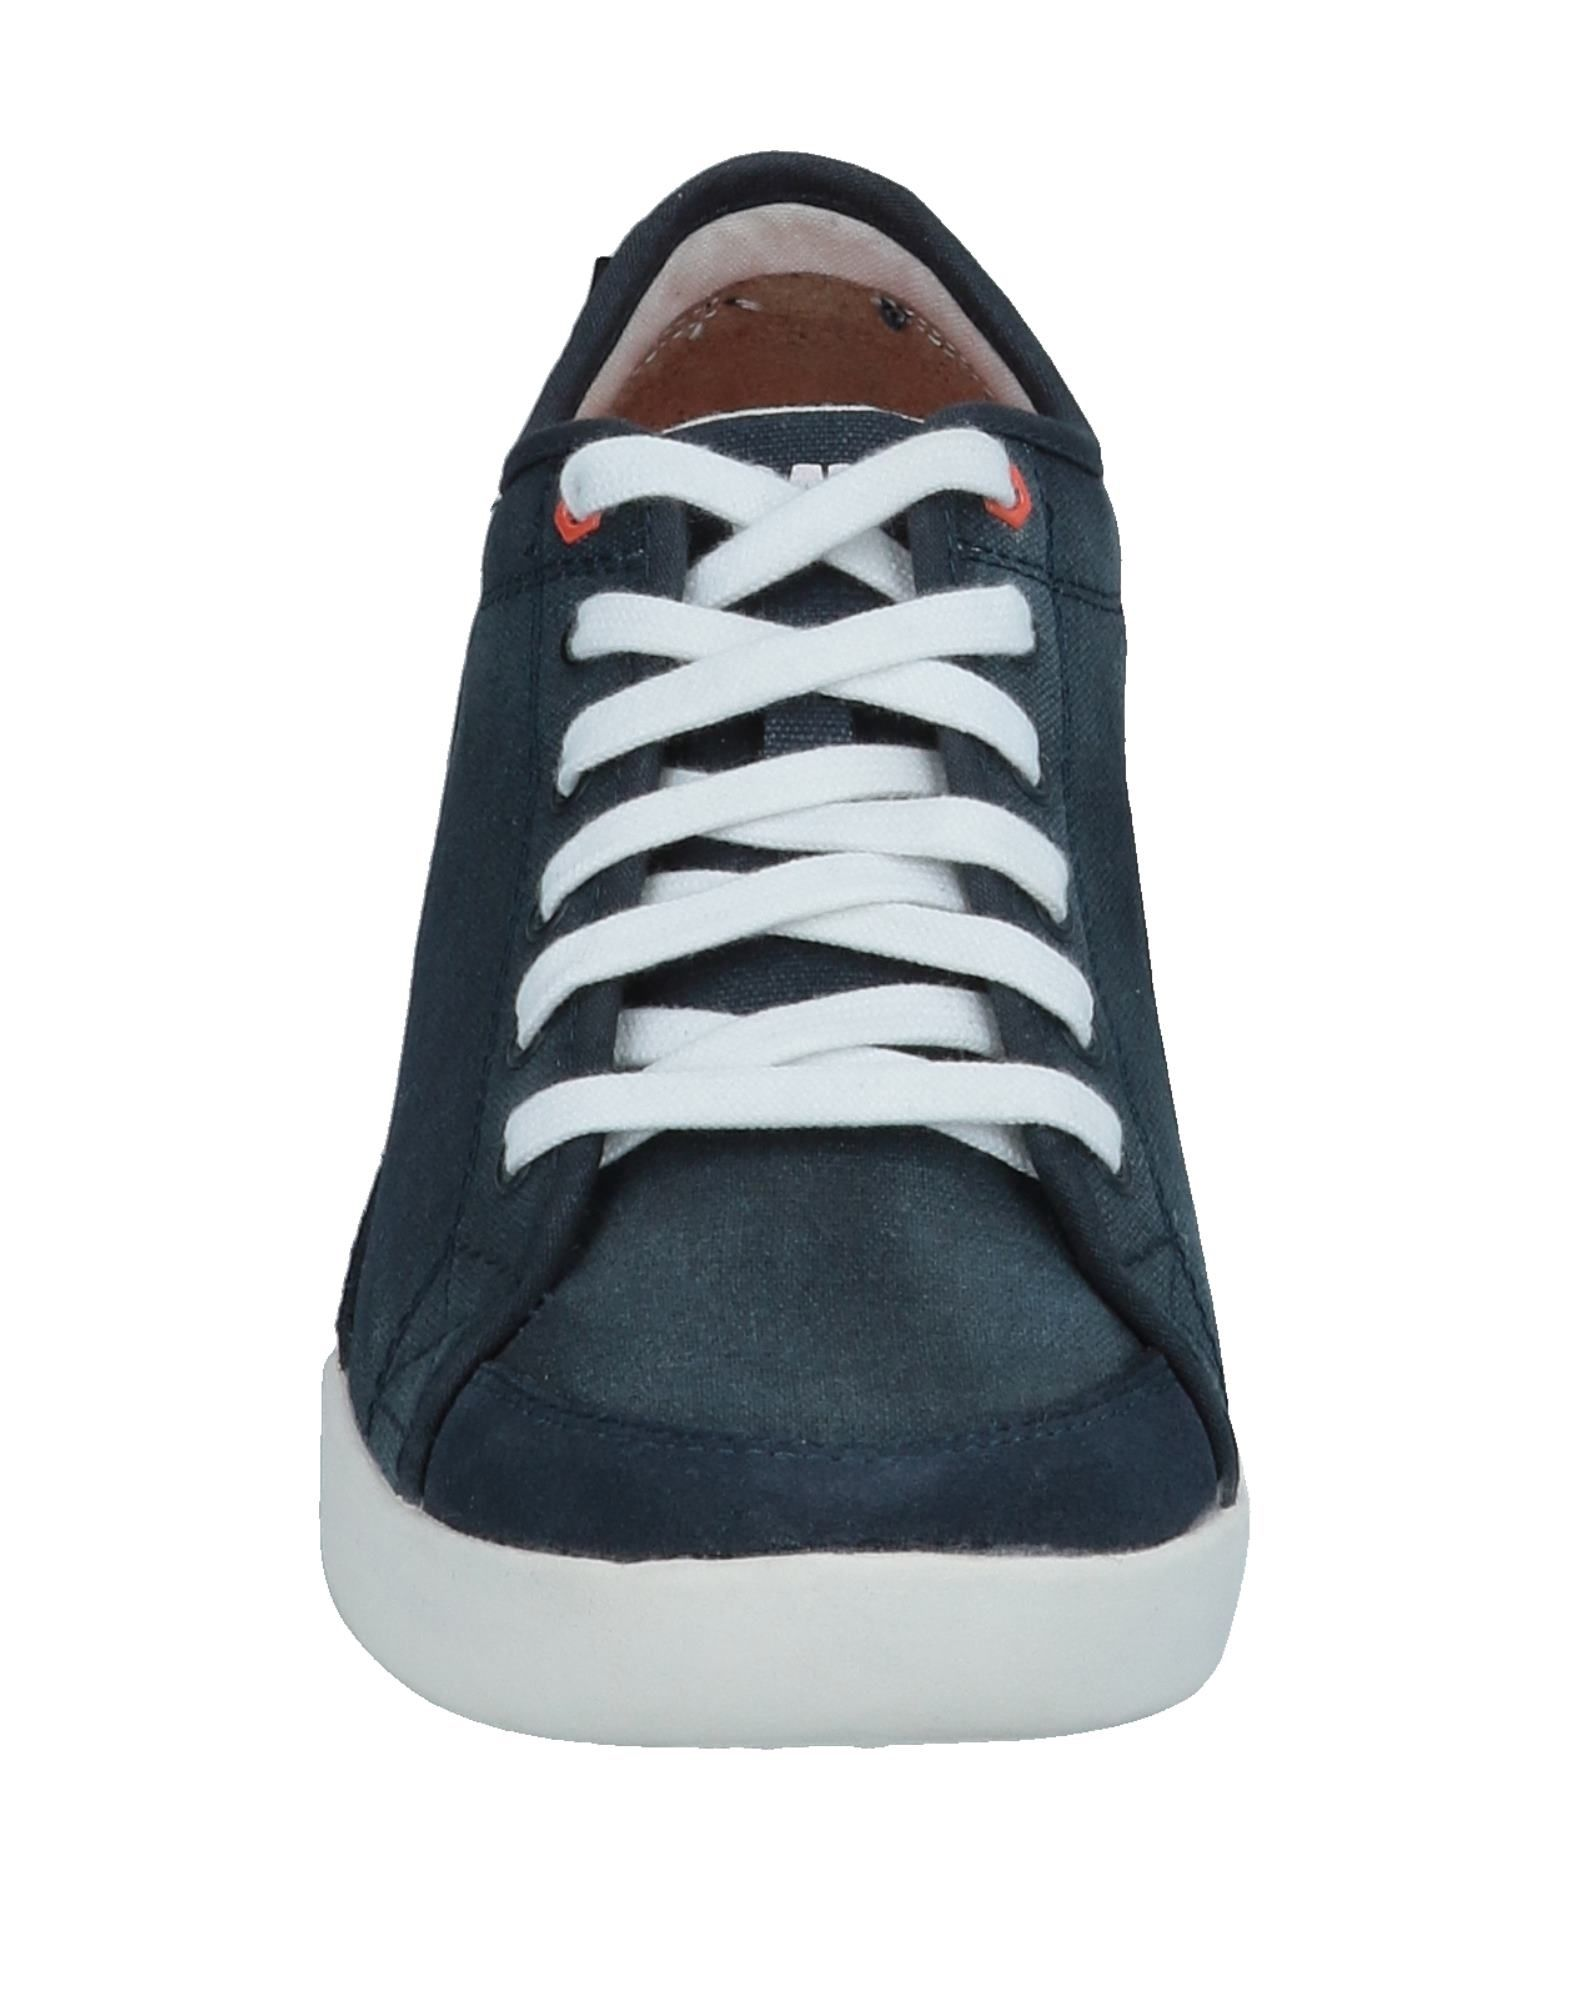 Cat Cat Cat Sneakers - Men Cat Sneakers online on  Canada - 11560779MW 7fcd50